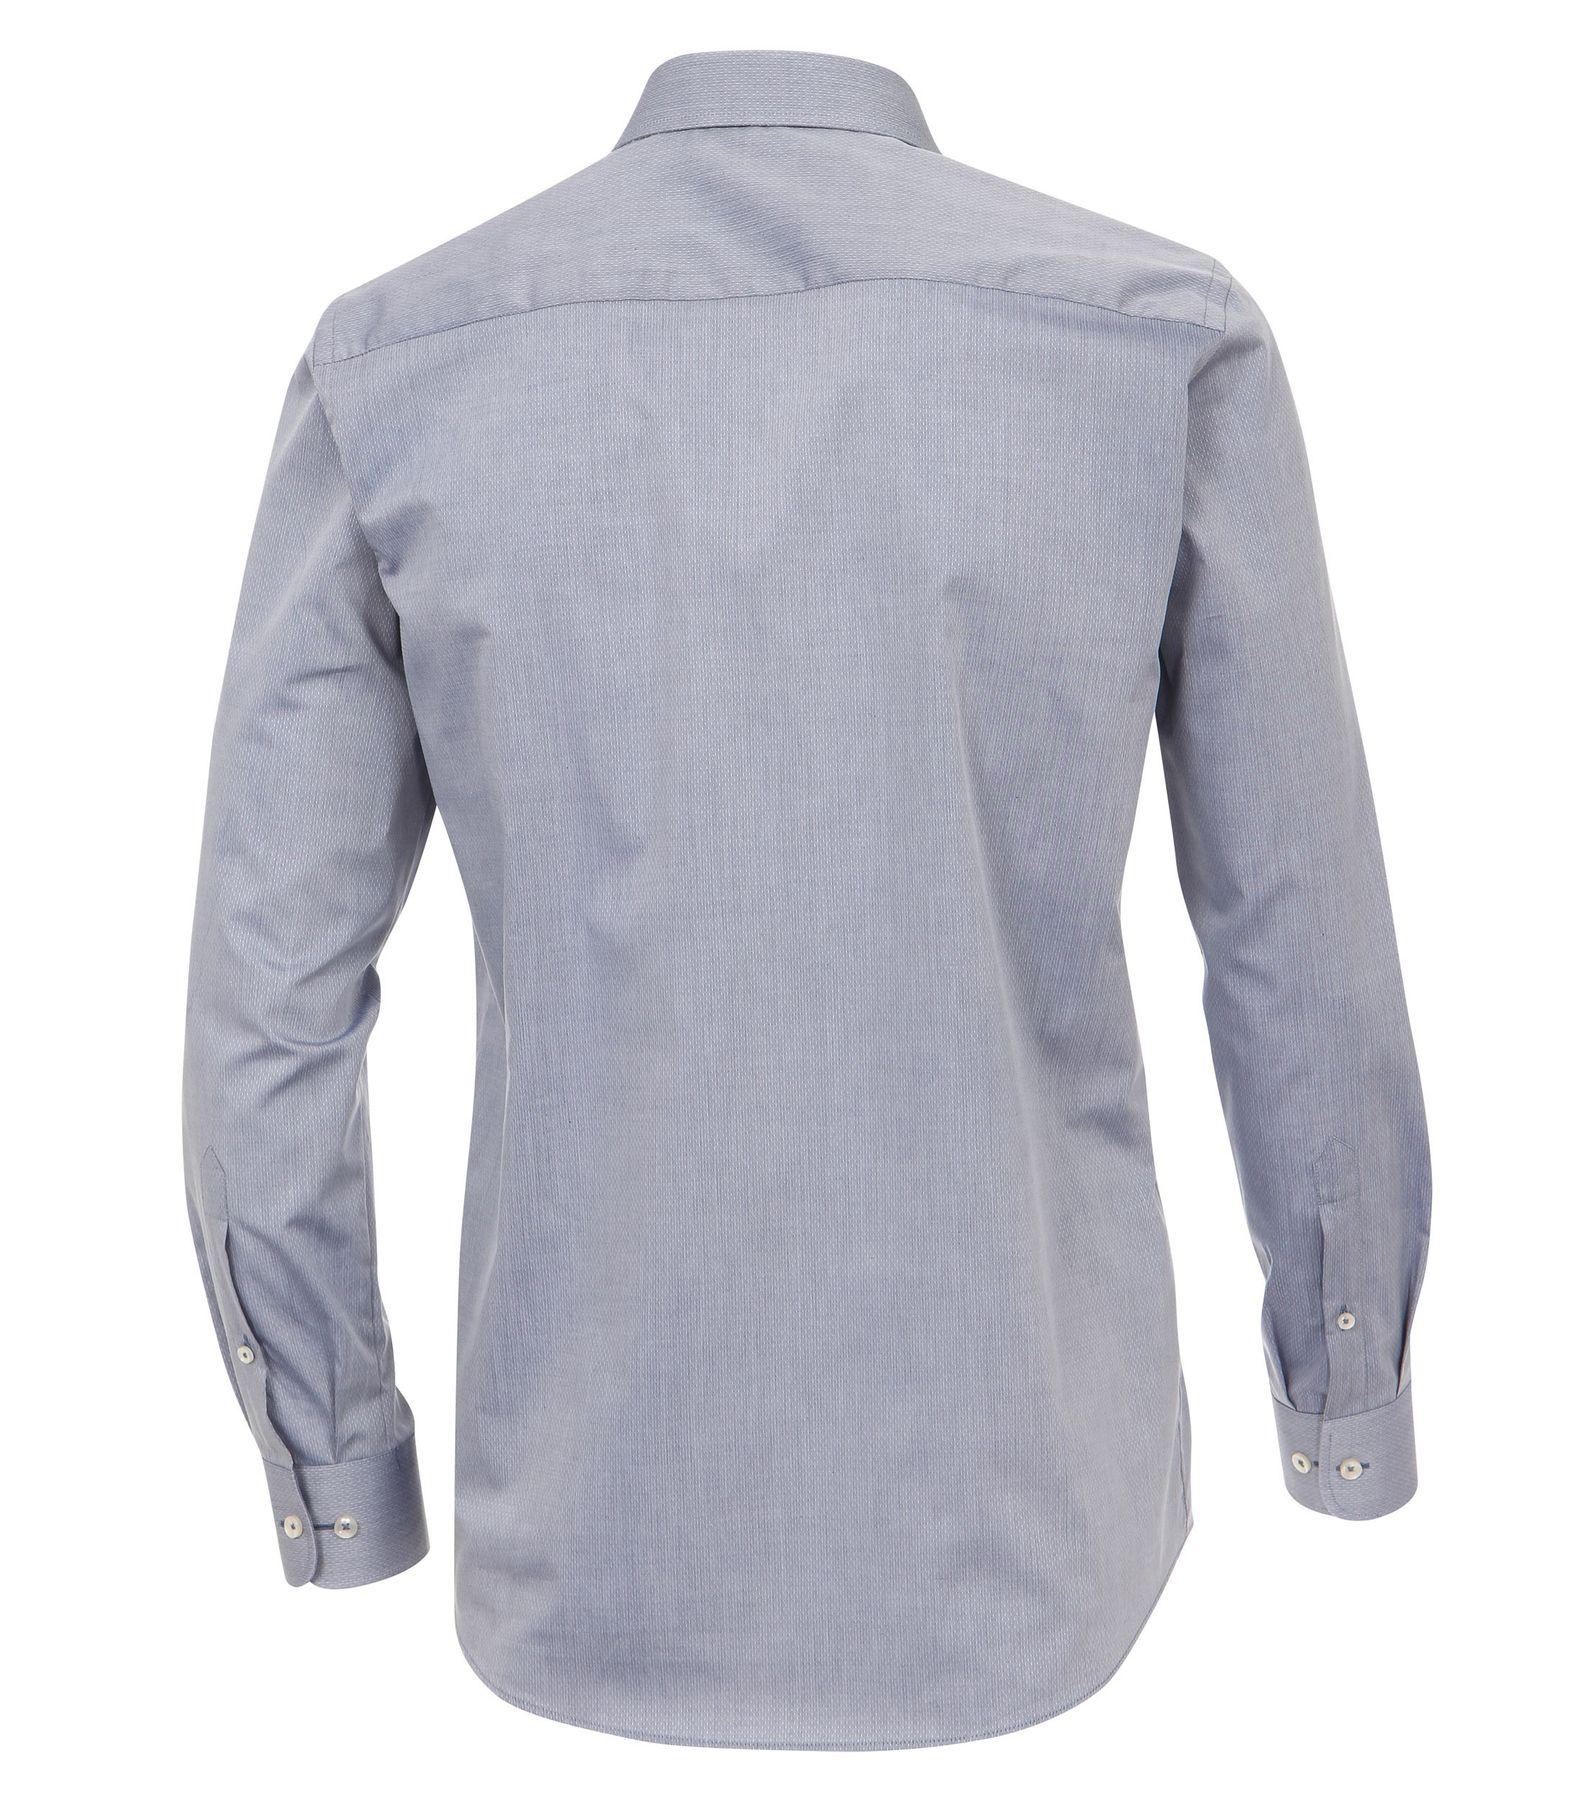 Casa Moda - Modern Fit - Herren langarm Hemd mit Shark Kragen, Uninah (372682600A) – Bild 12